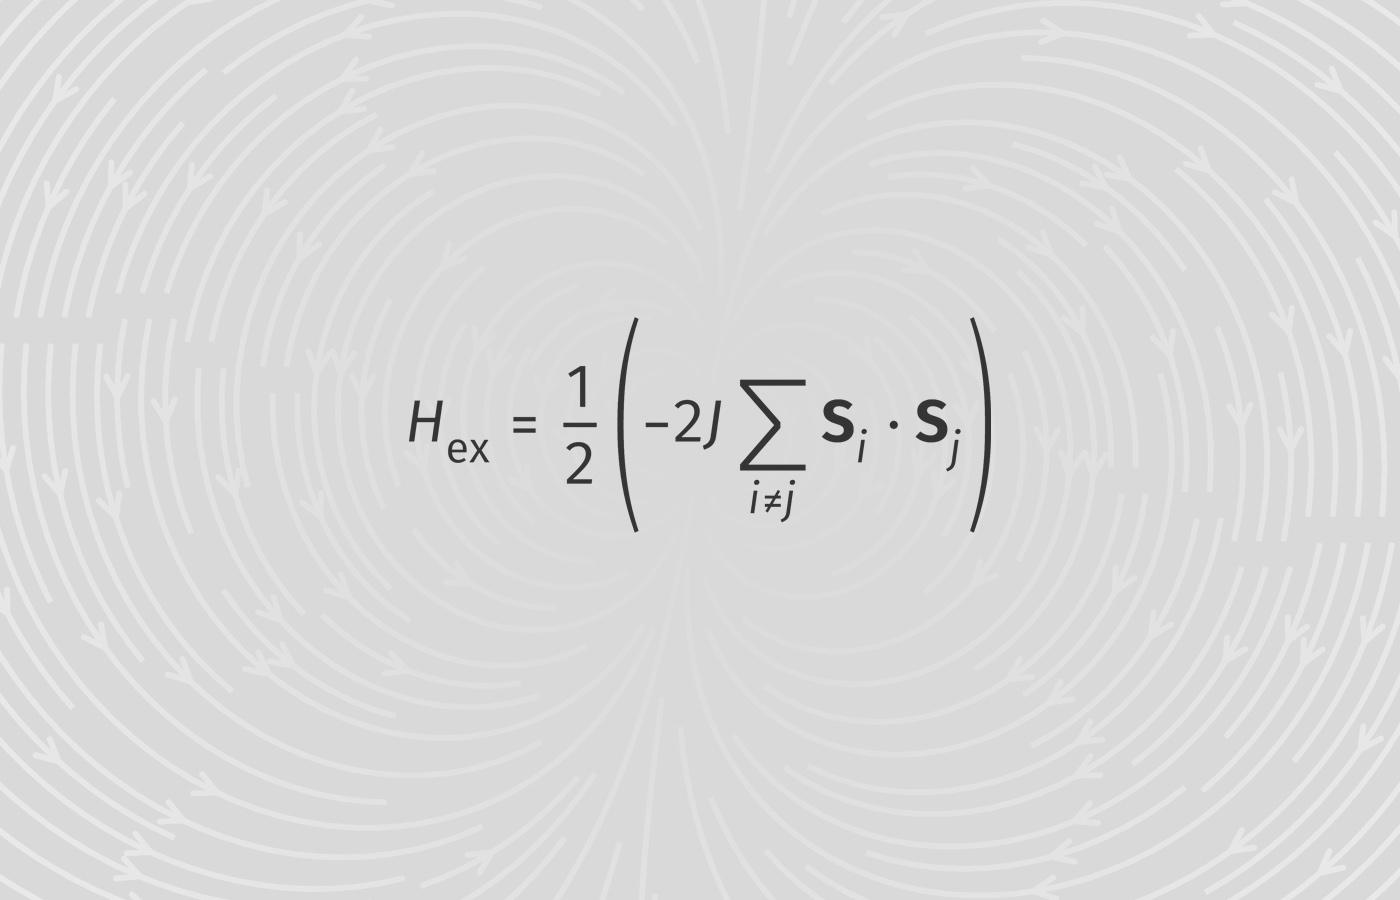 Exchange Coupling and Exchange Stiffness 交换关联与交换强度